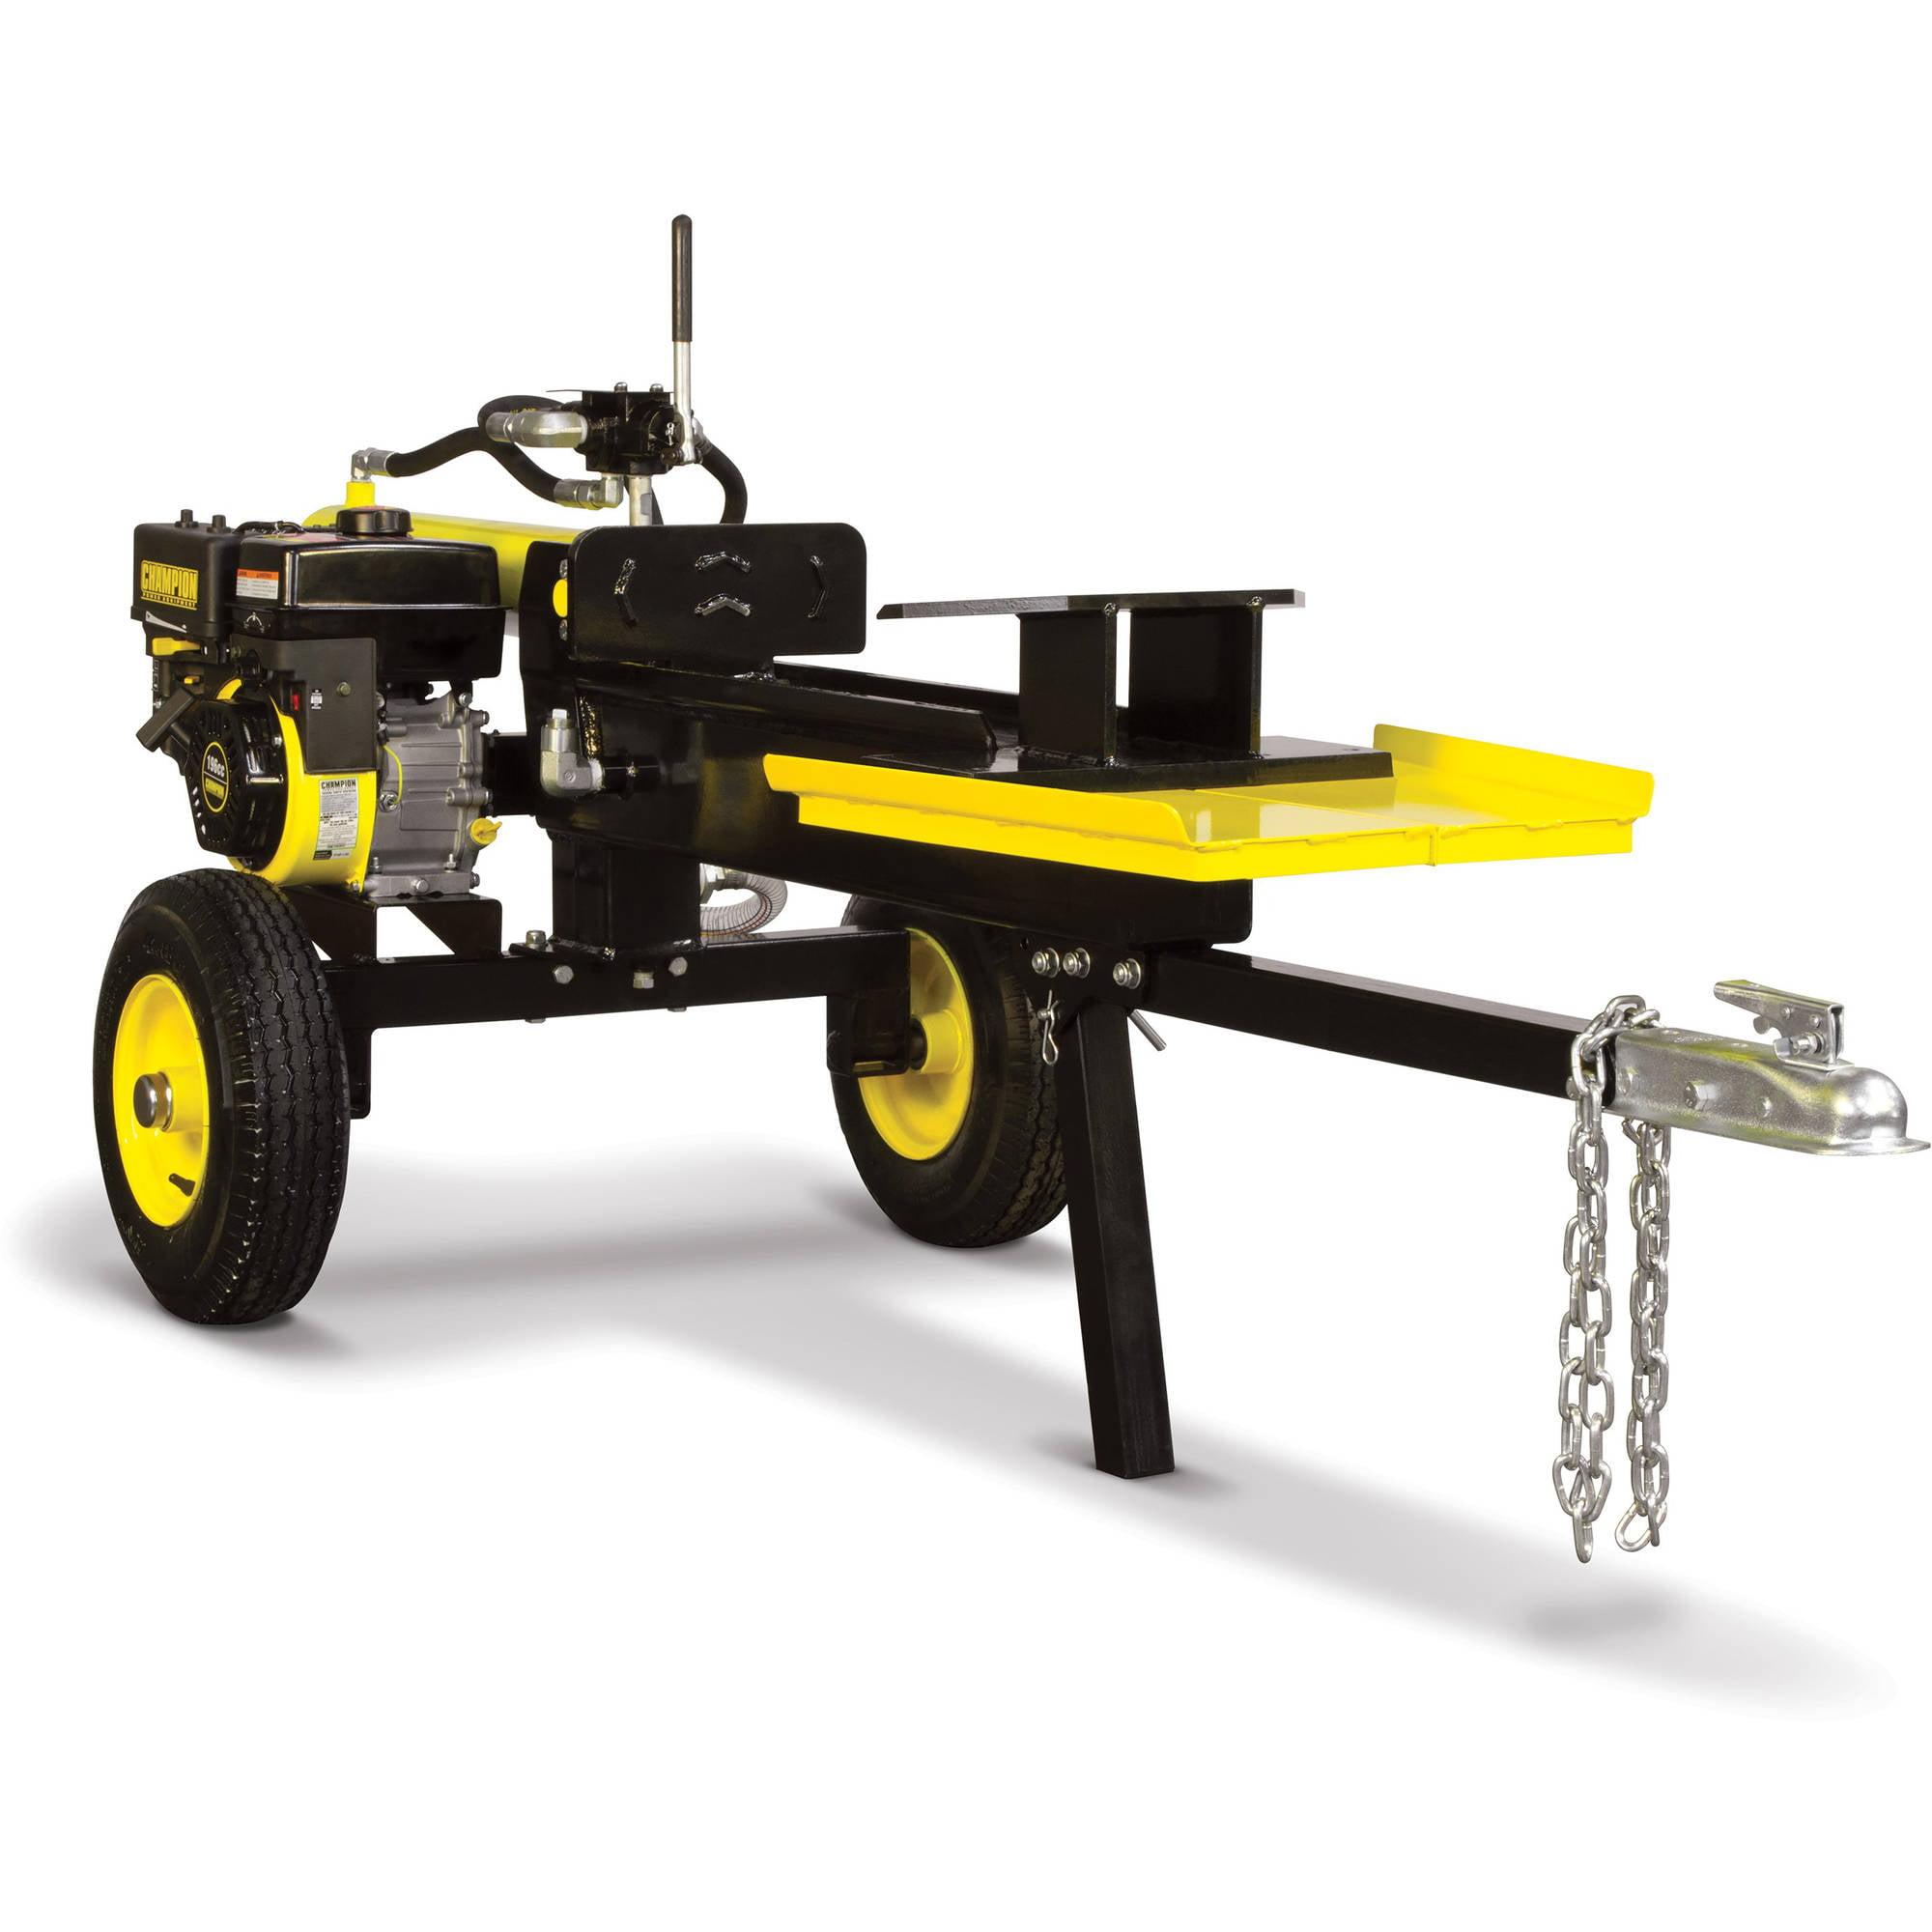 Champion Power Equipment 100236 22 Ton Multi-Wedge Towable Log Splitter by Champion Power Equipment